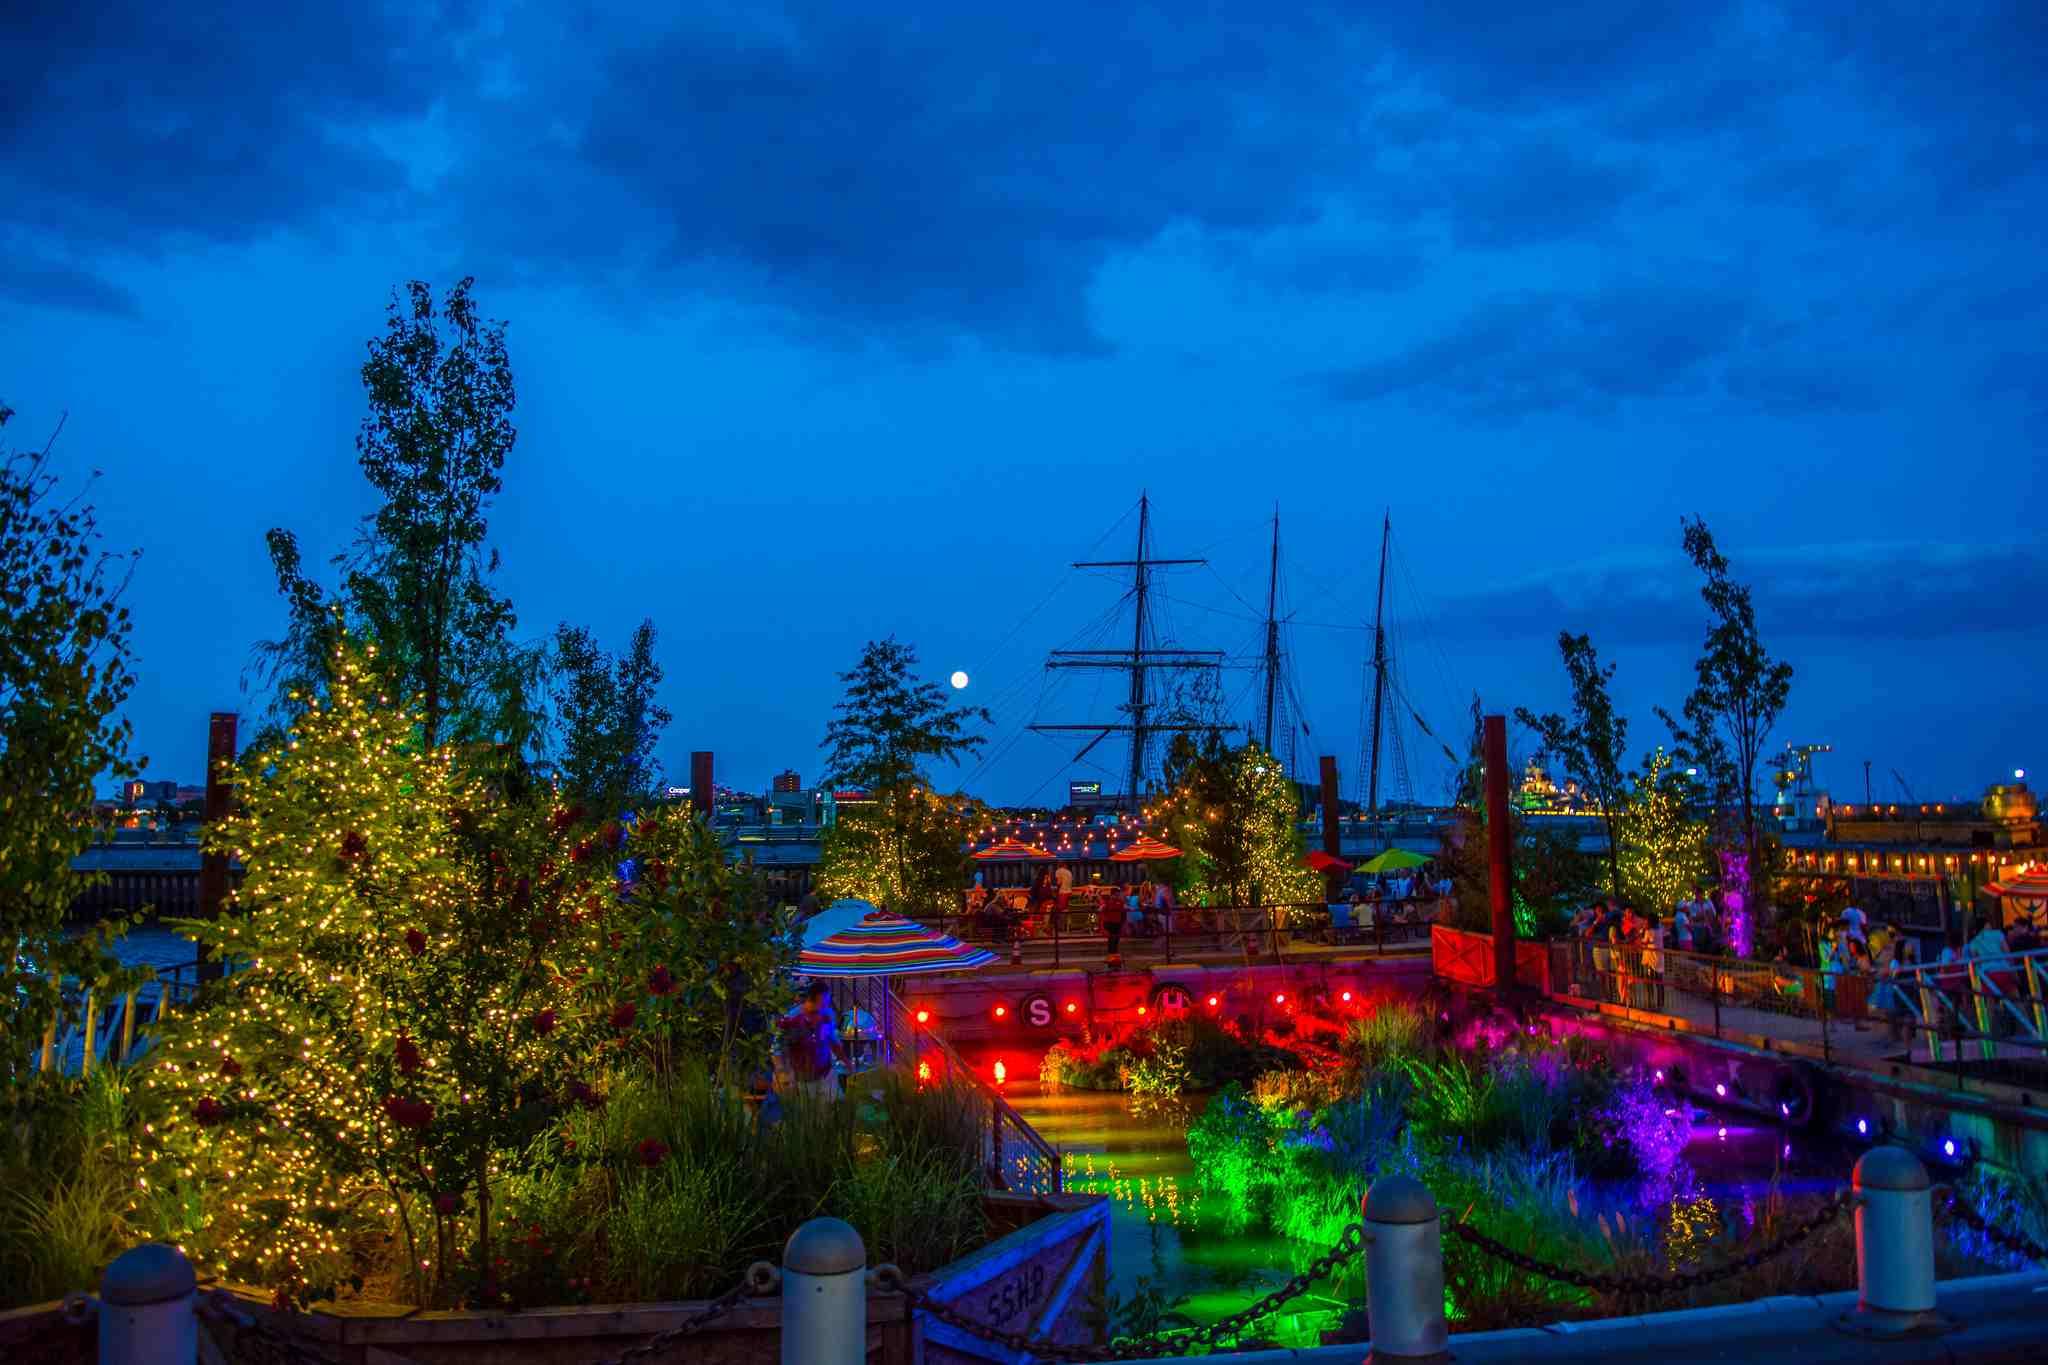 Spruce Street Harbor Park at night